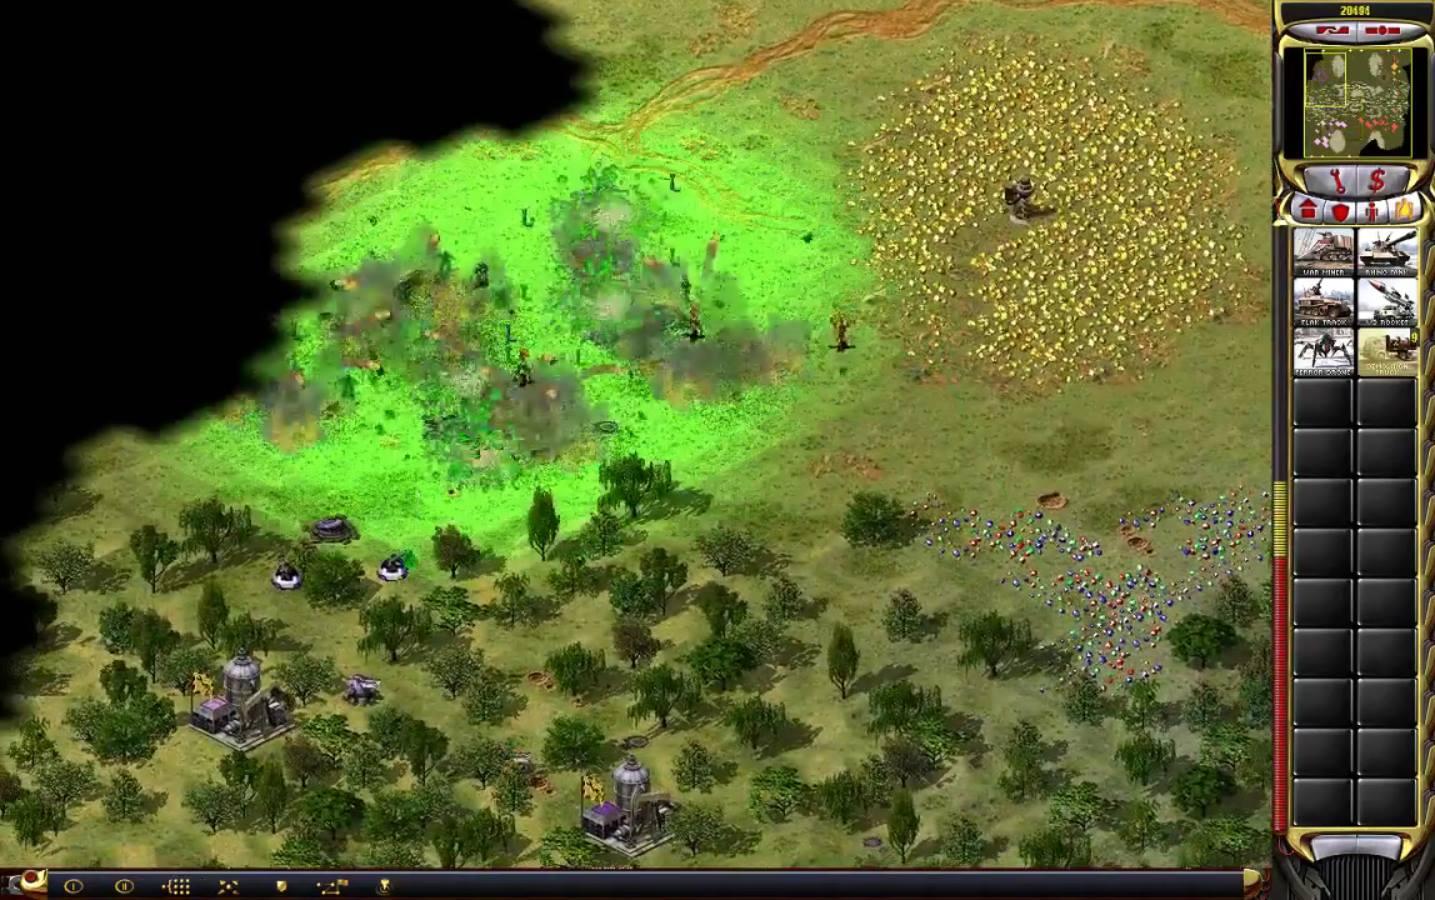 Red Alert 2 Online เกมยุทธกาล เกรียงไกร2